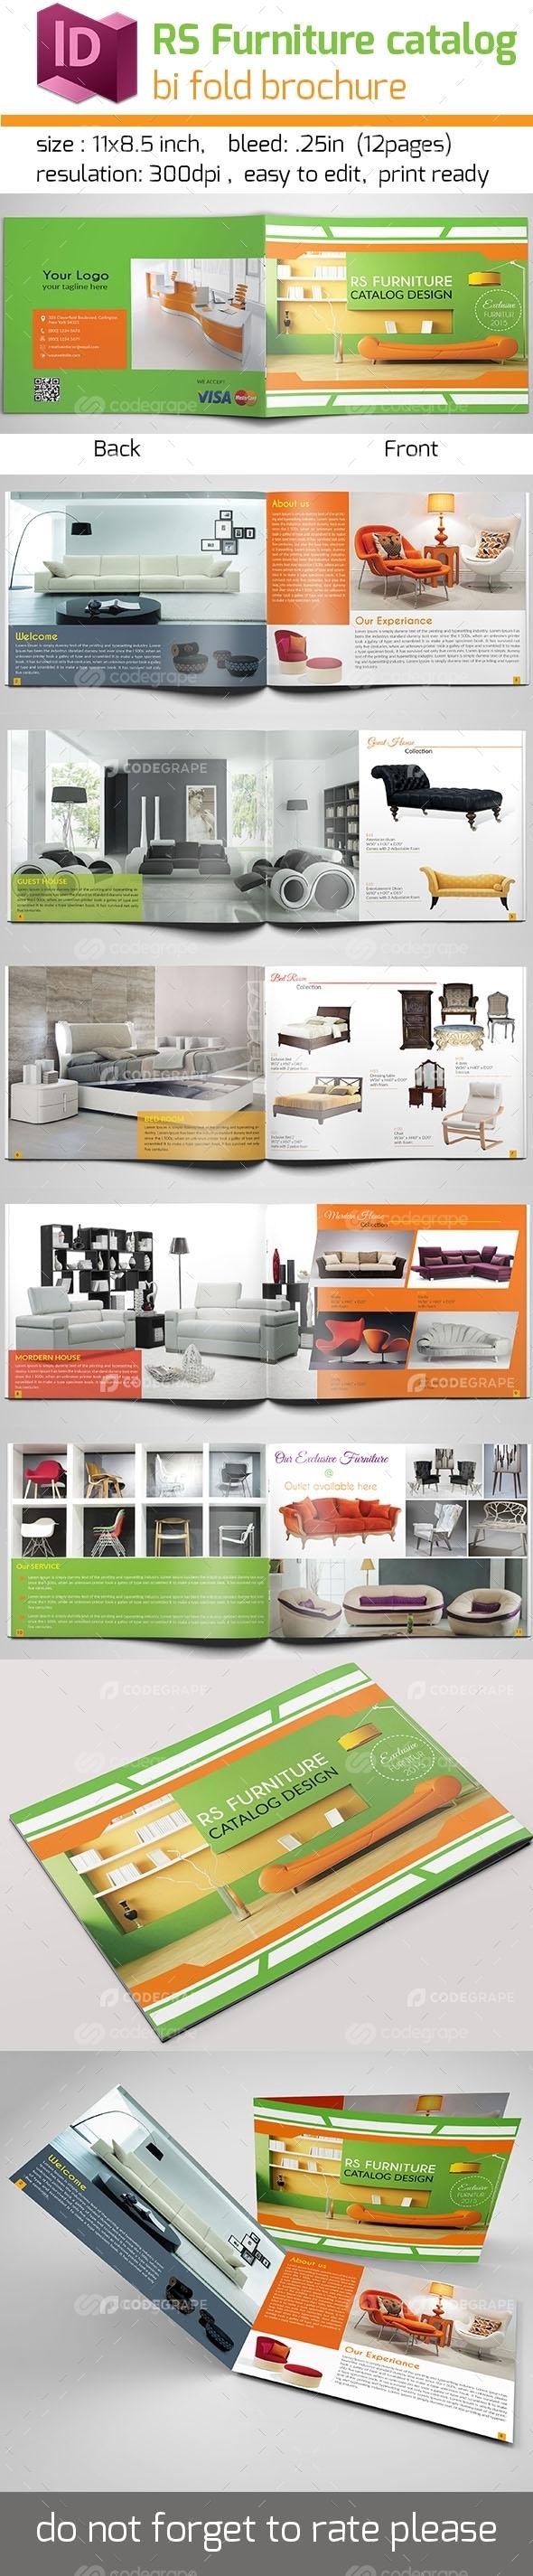 RS Furniture Bi Fold Brochure